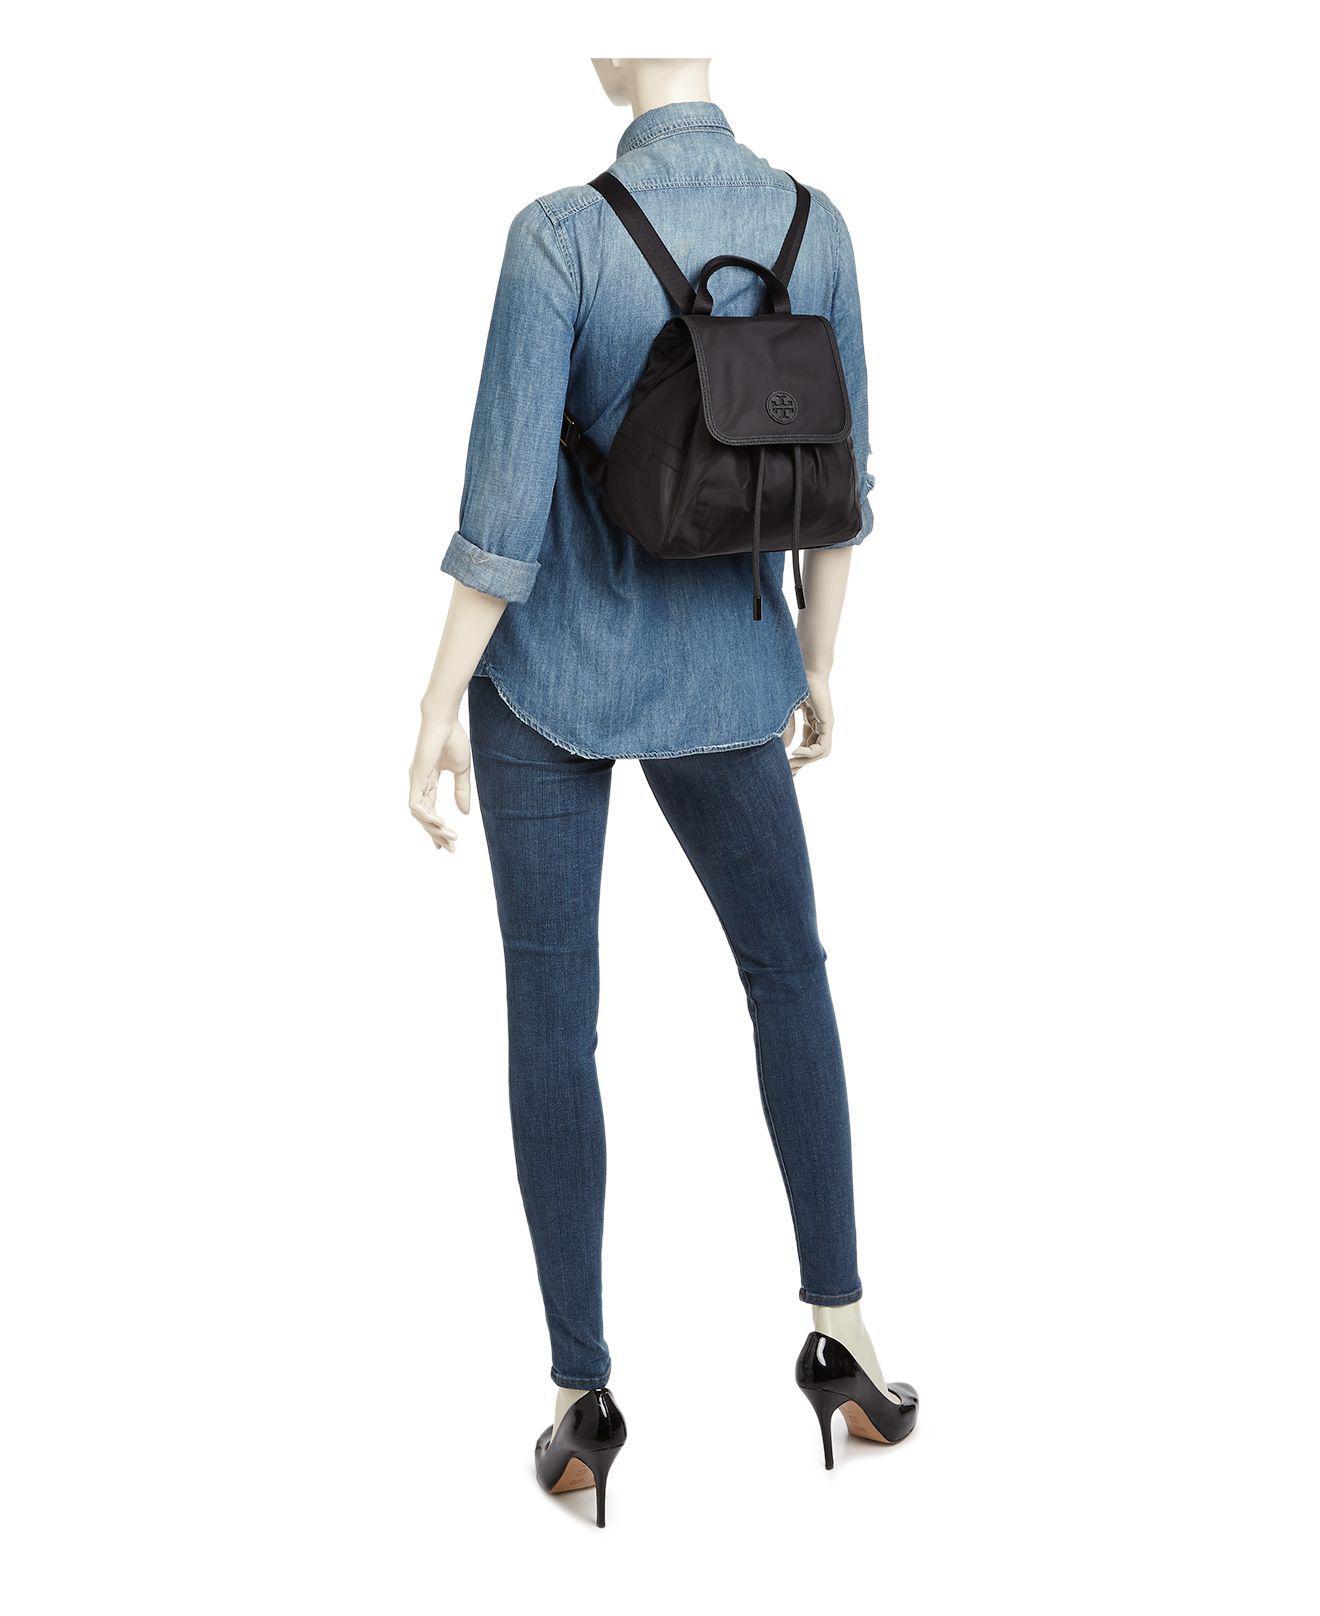 e0db2ff28c2 Lyst - Tory Burch Scout Mini Nylon Backpack in Black